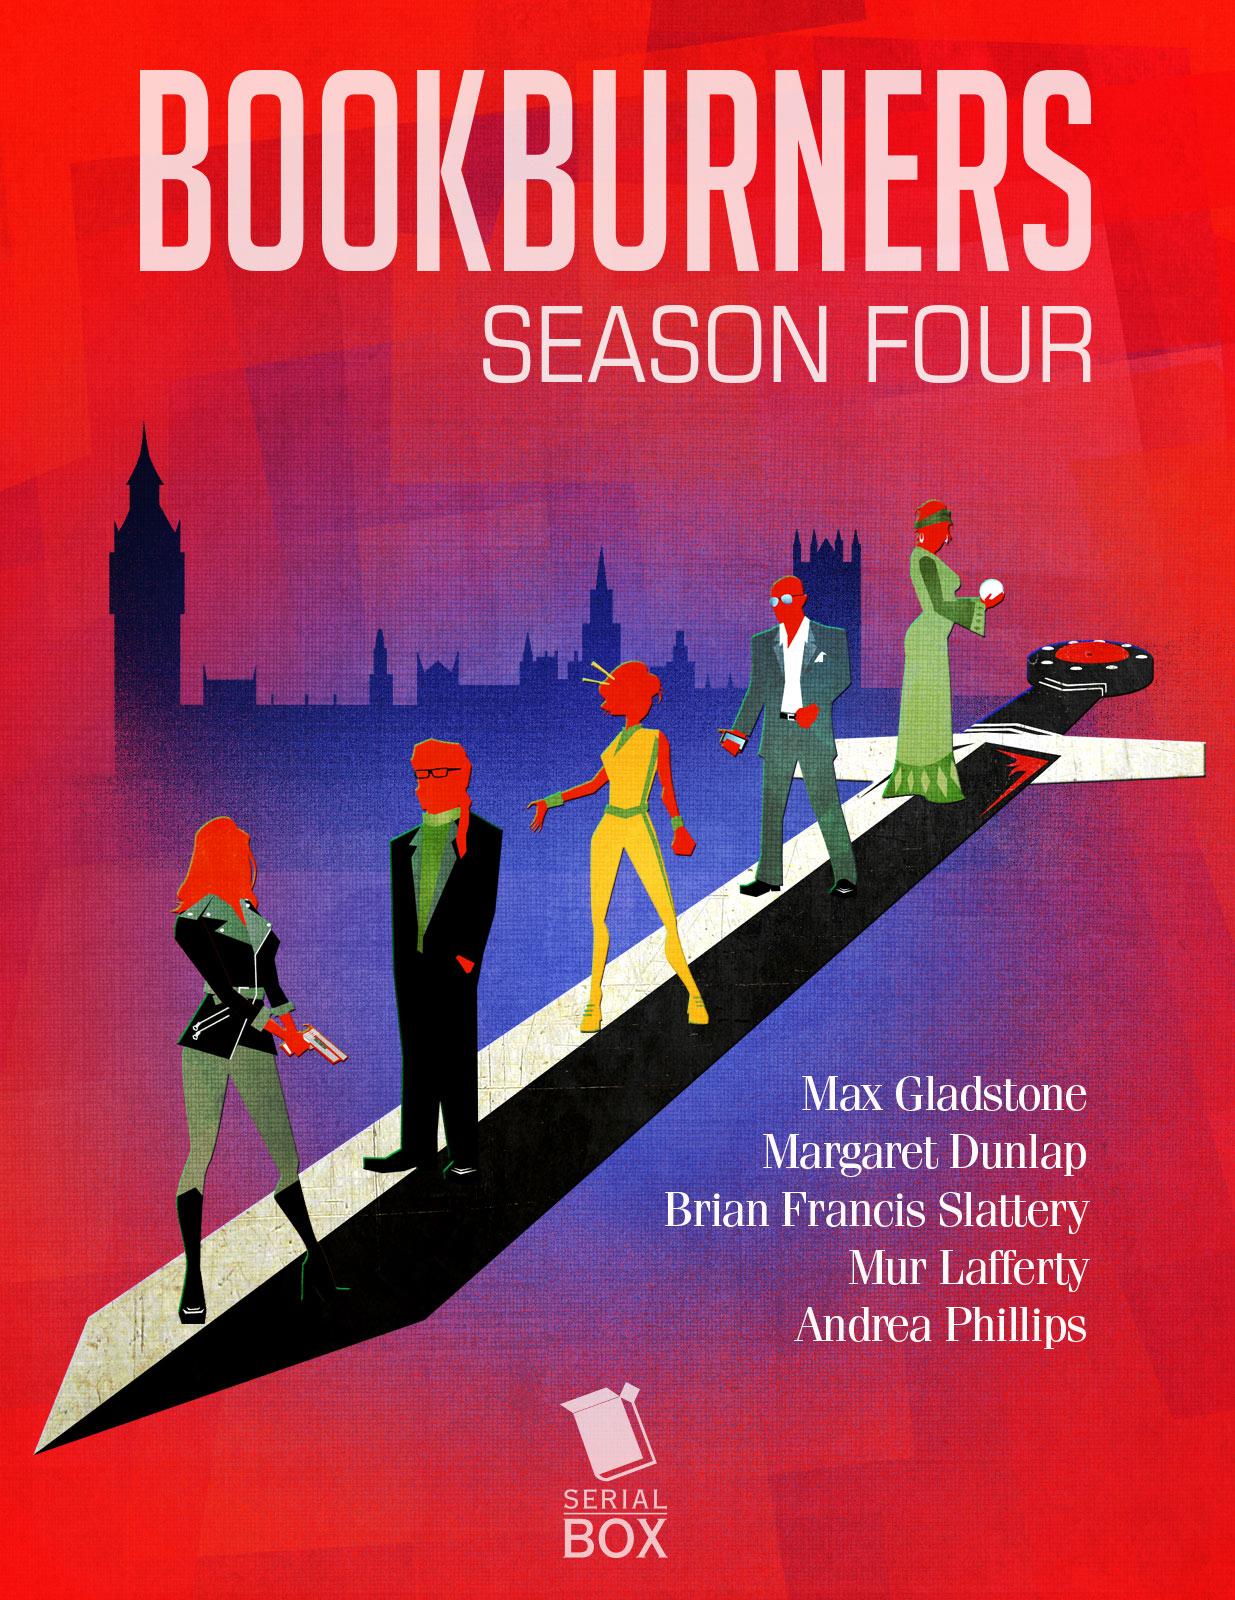 Bookburners Season 4 cover image